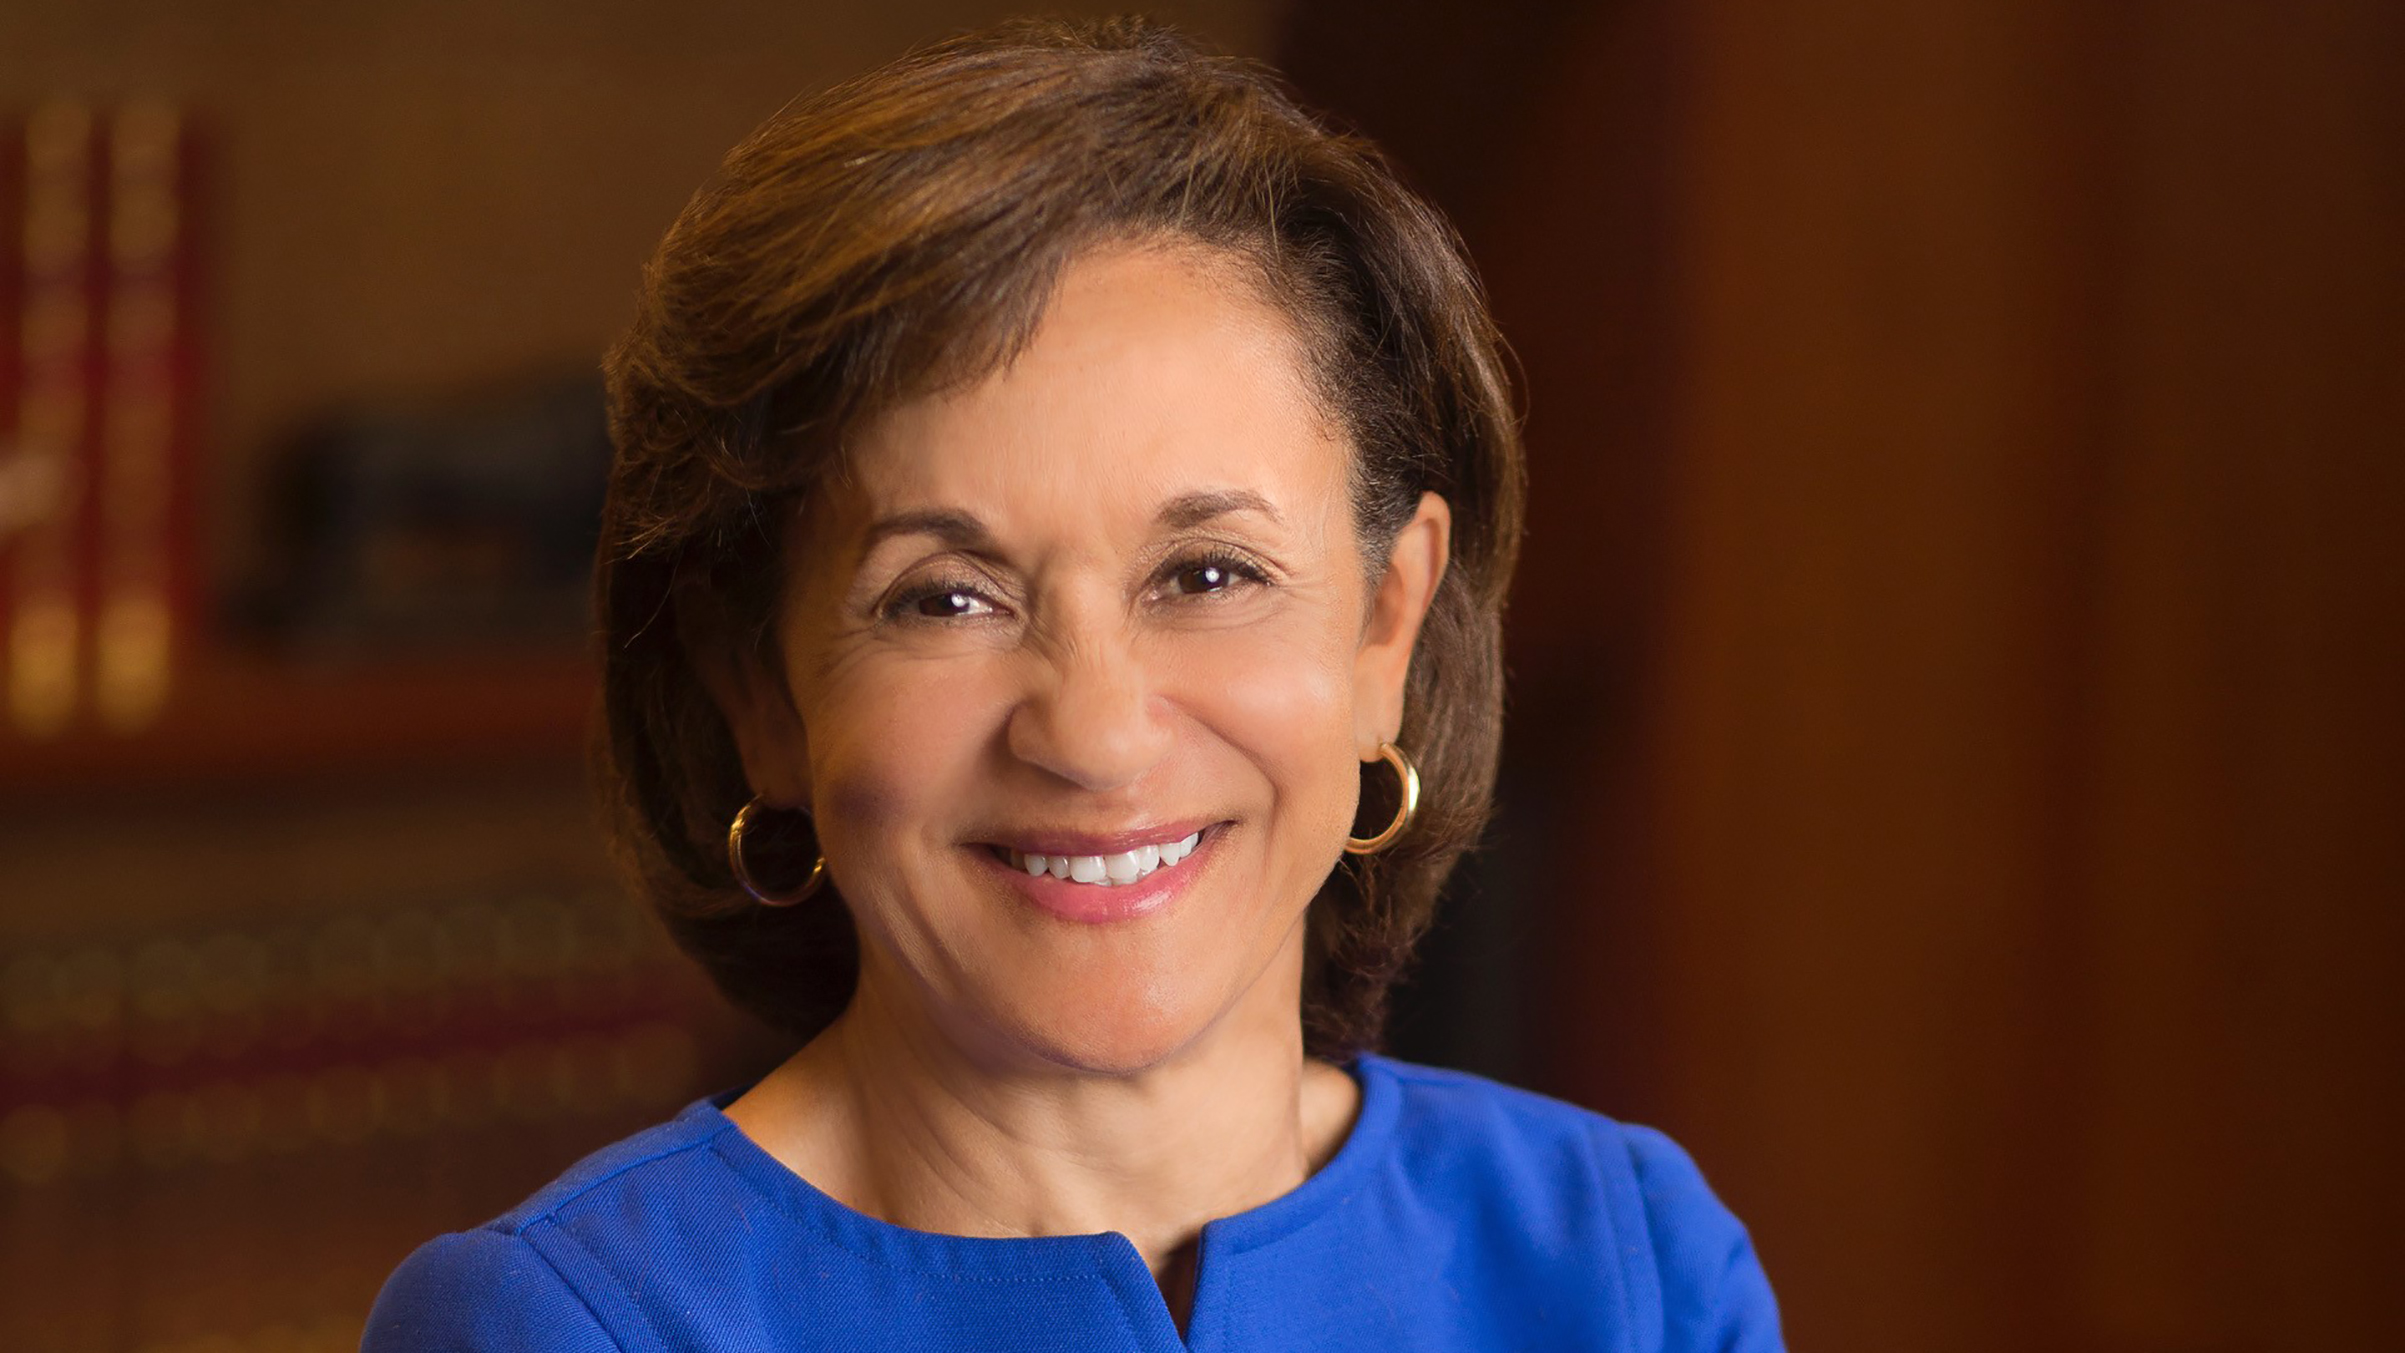 Glenda McNeal, President, Enterprise Strategic Partnerships at American Express.